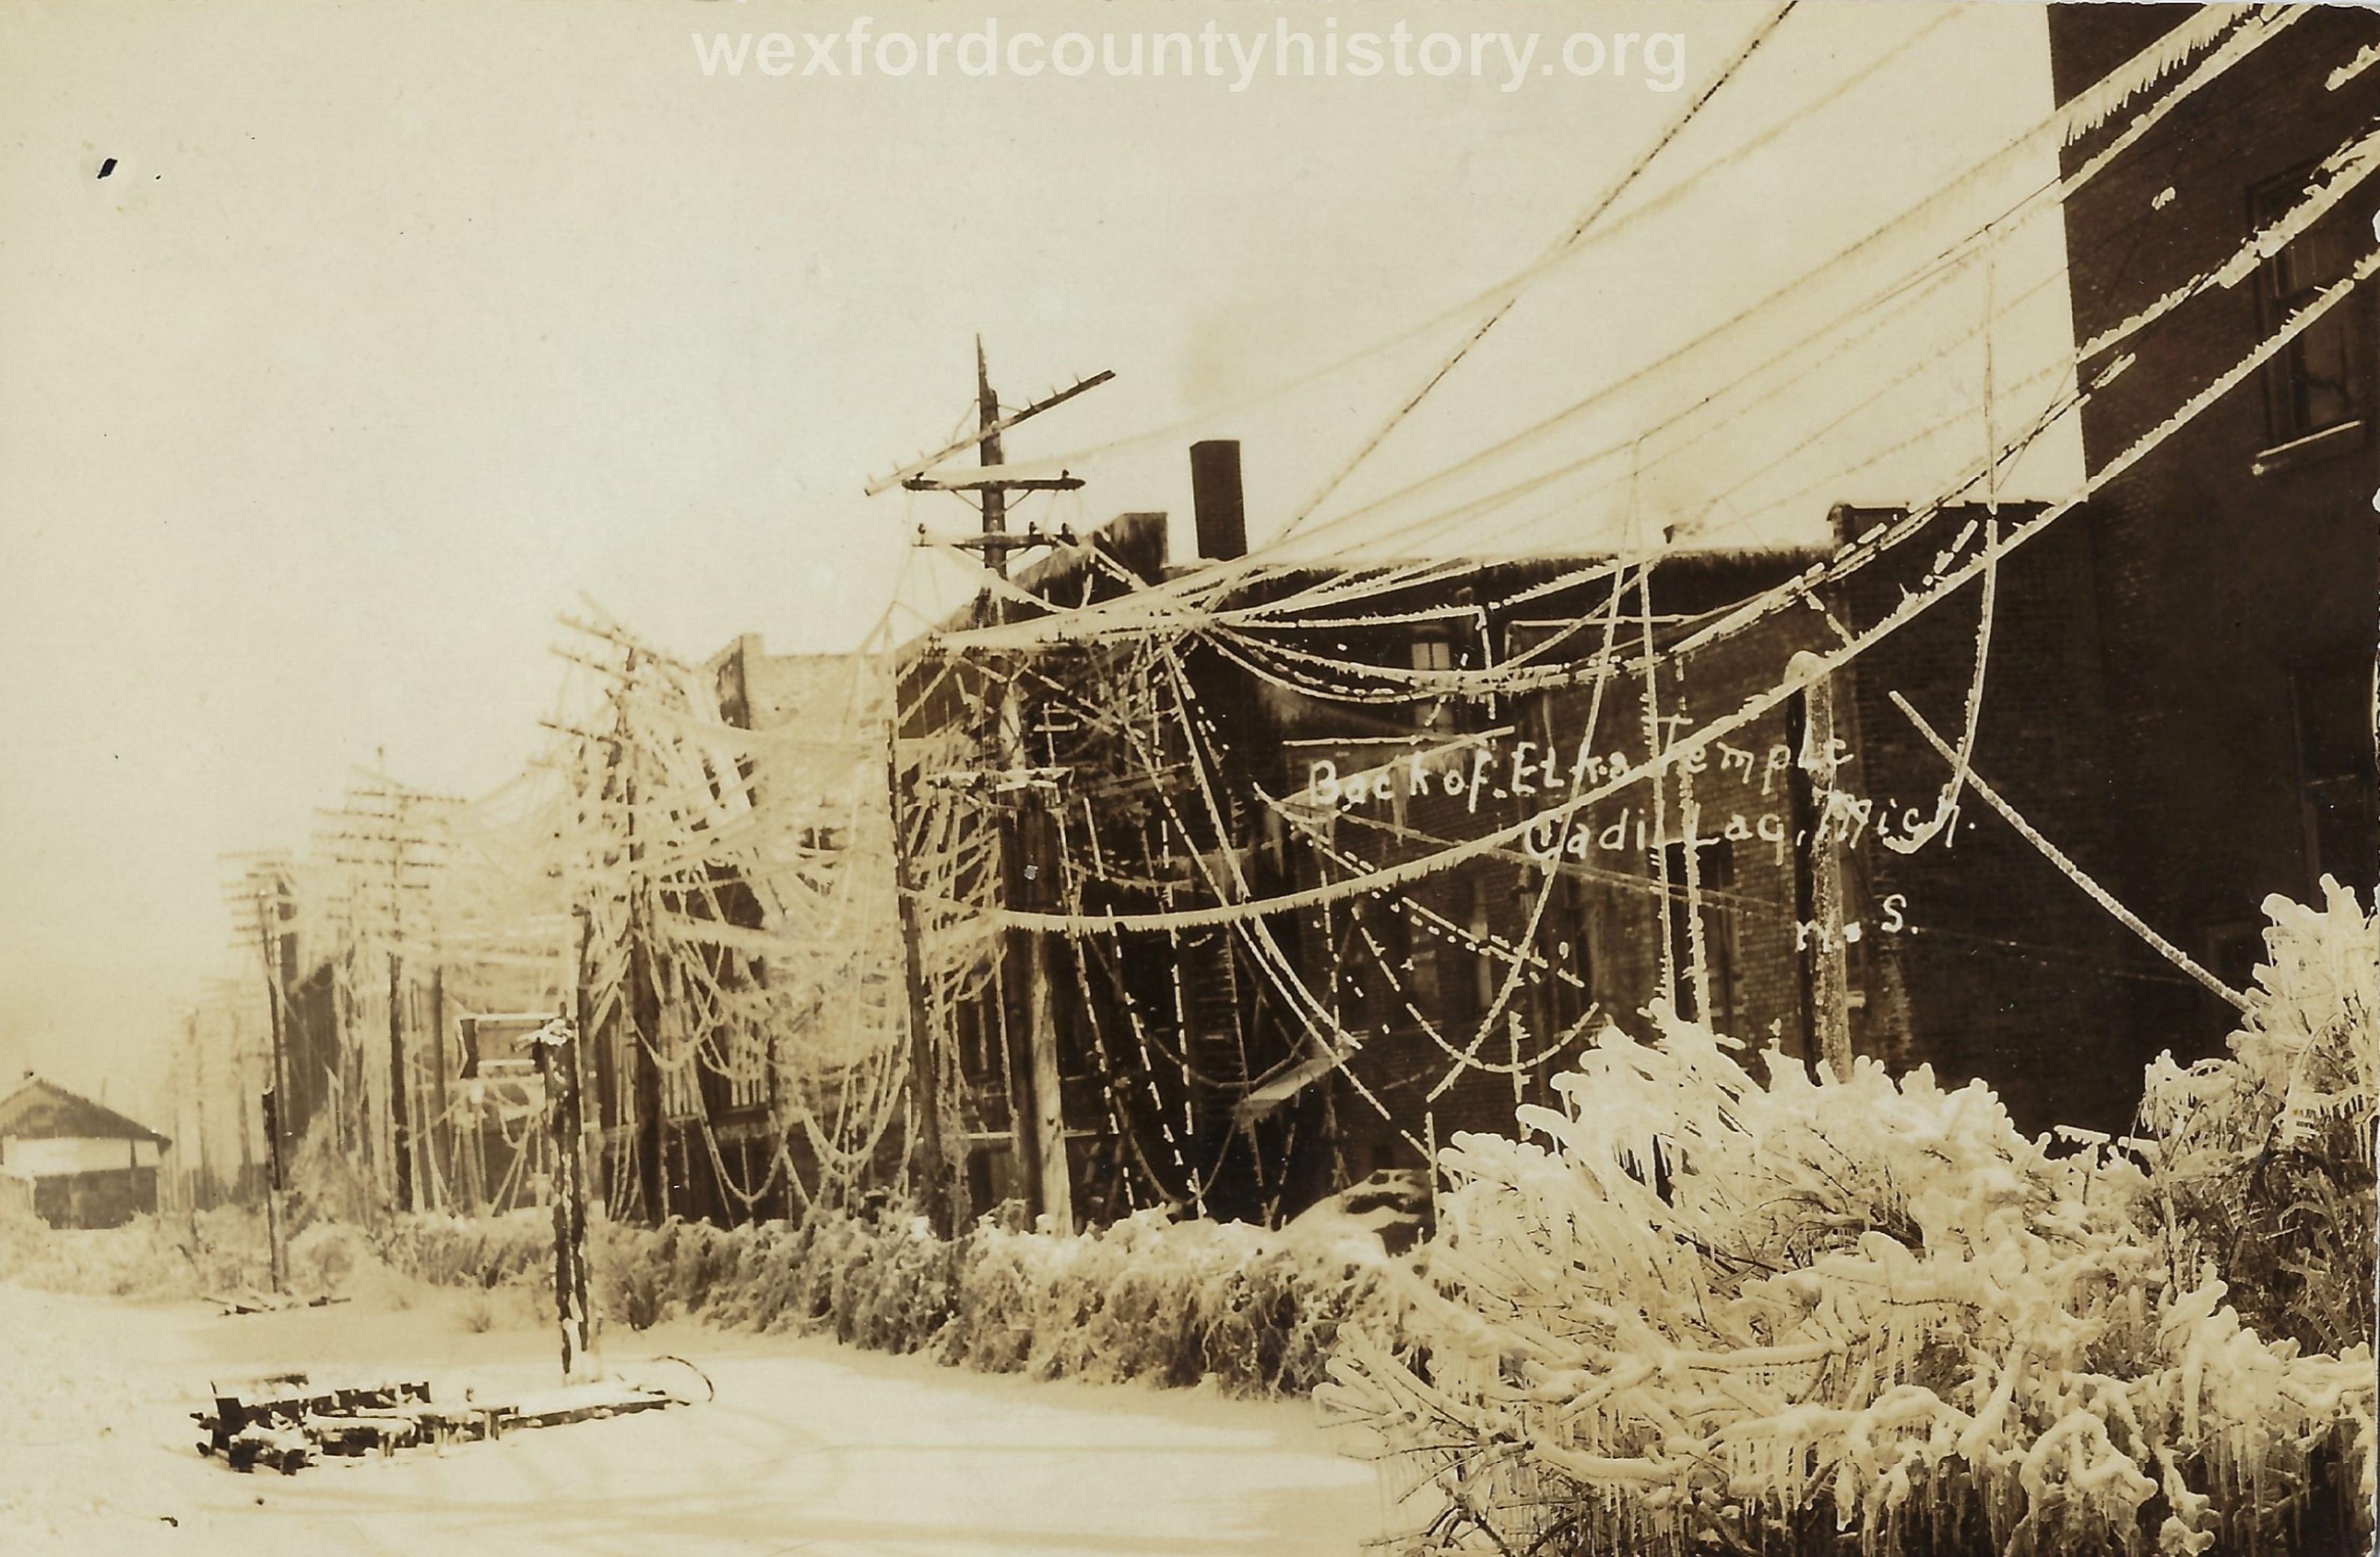 1922 Ice Storm - Back of Elks